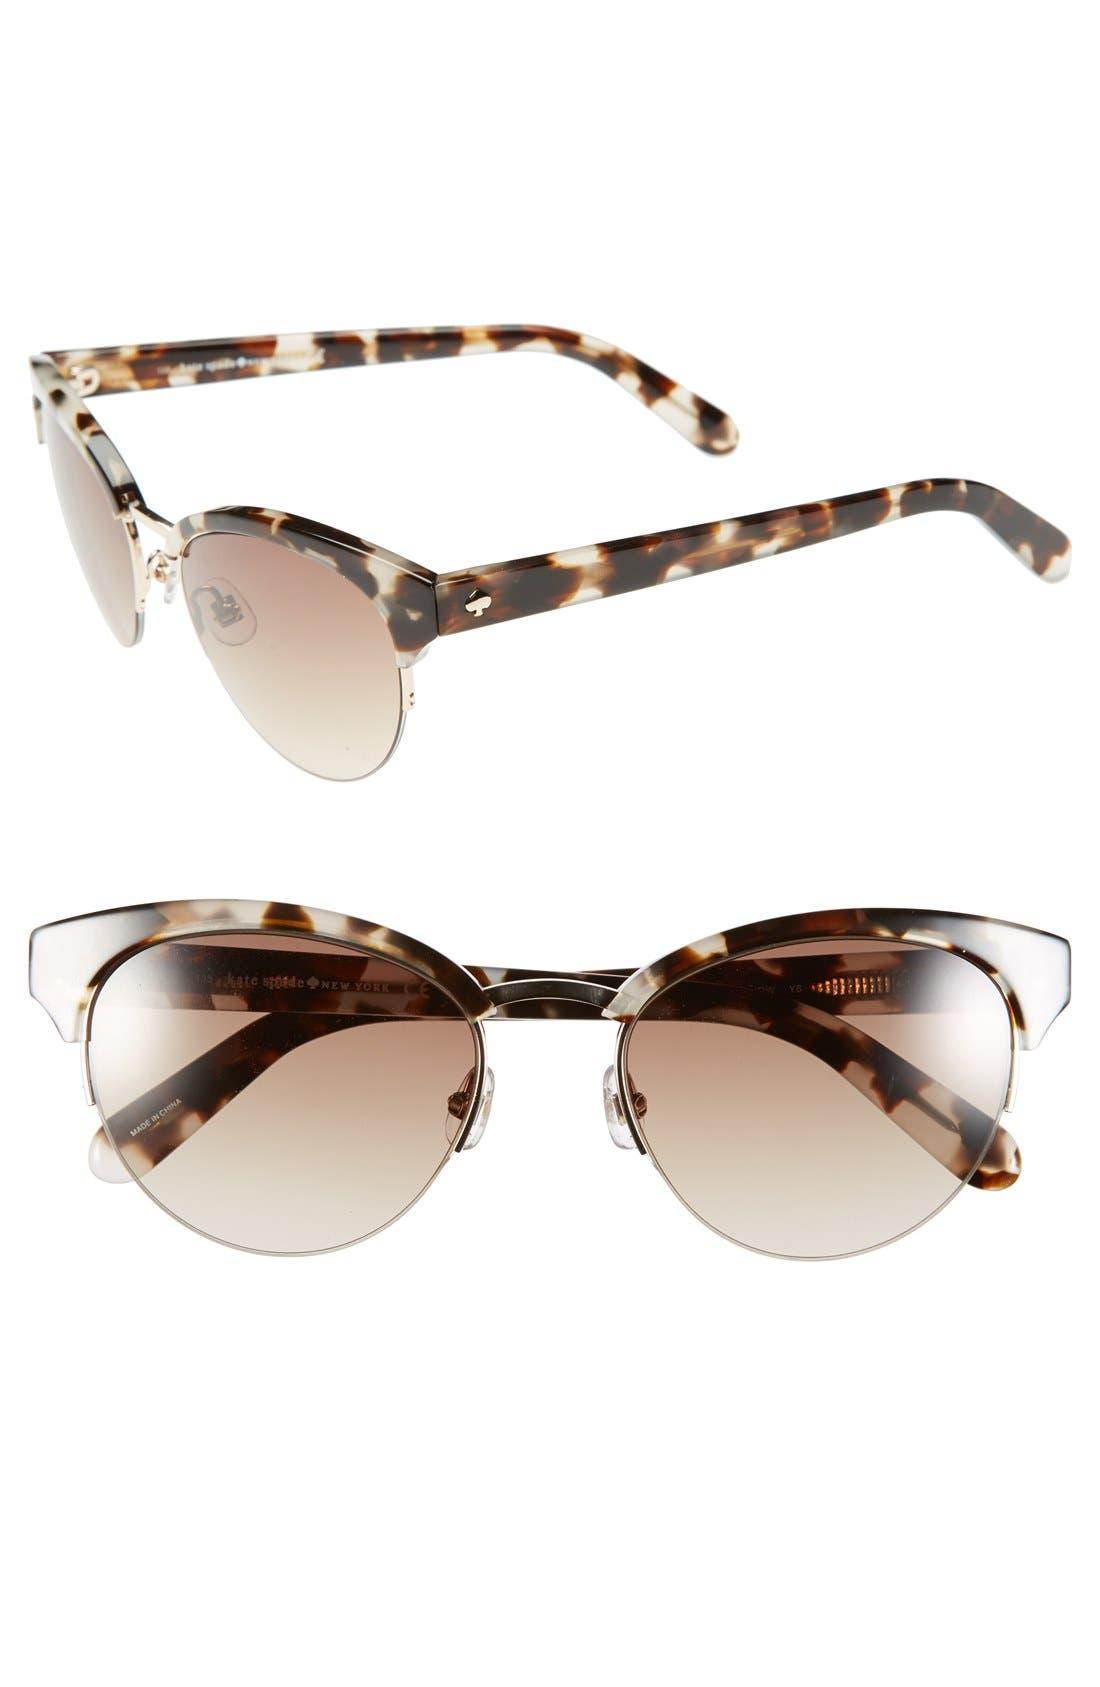 Alternate Image 1 Selected - kate spade new york 53mm cat eye sunglasses